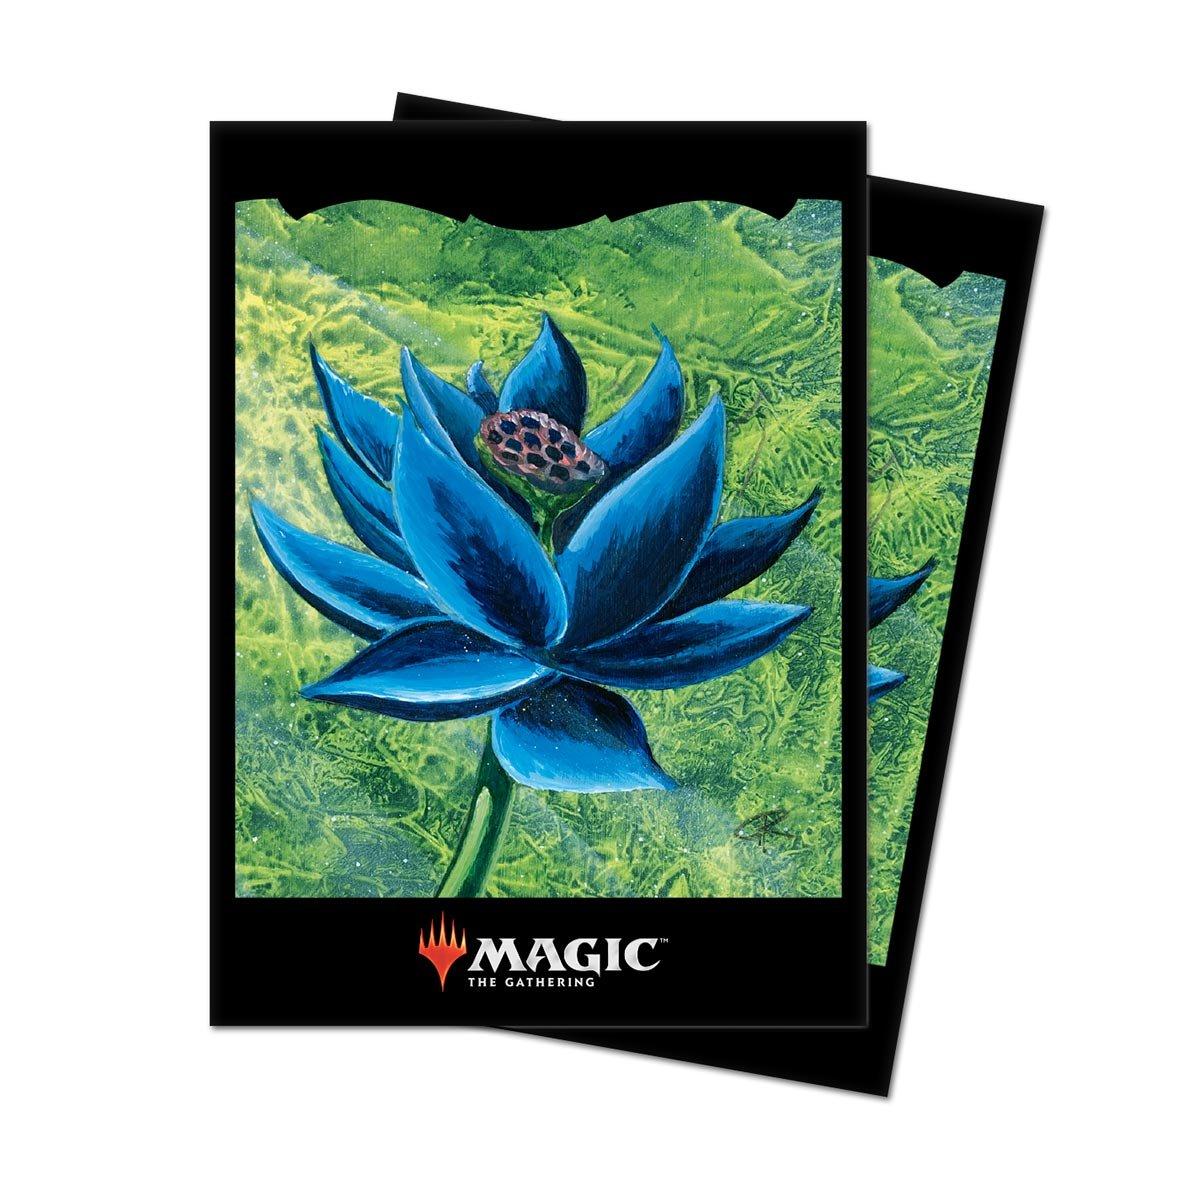 Black Dragon /& Magic The Gathering Card Sleeves Black Lotus Design Portable Ultra Pro Deluxe Card Carrying Case Bag Bundle